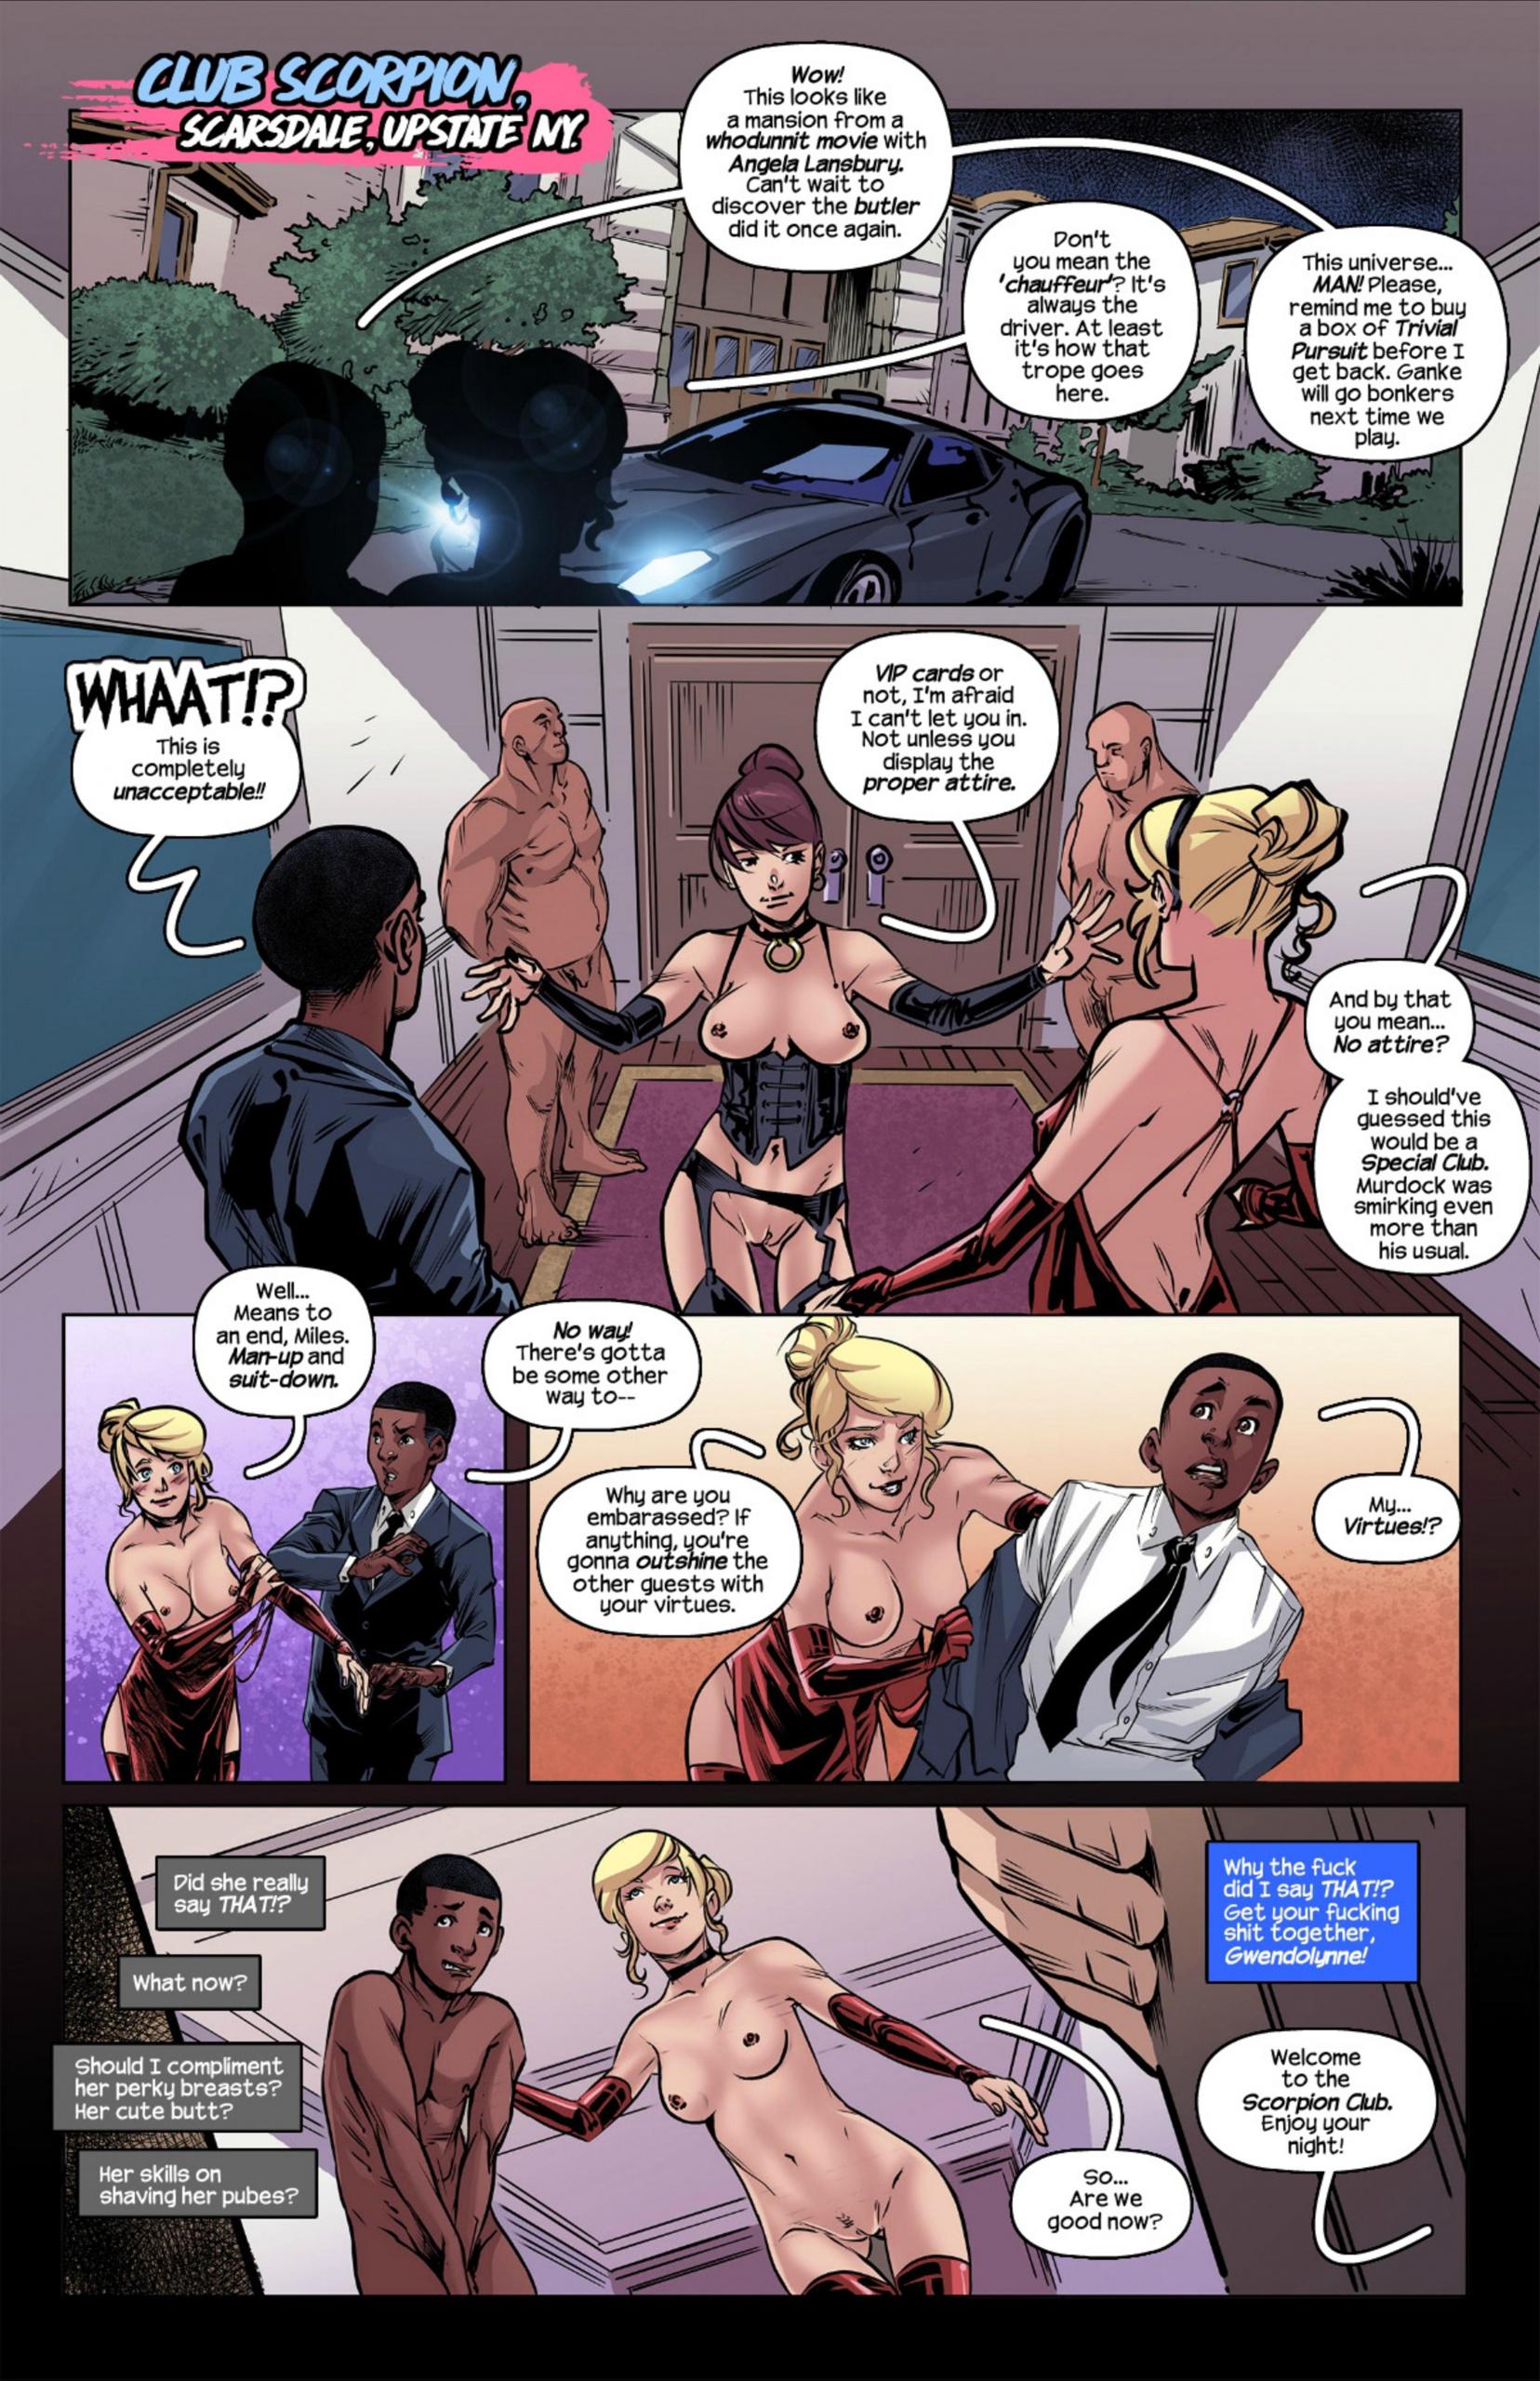 Weaving Fluids 1 porn comics Oral sex, Group Sex, Stockings